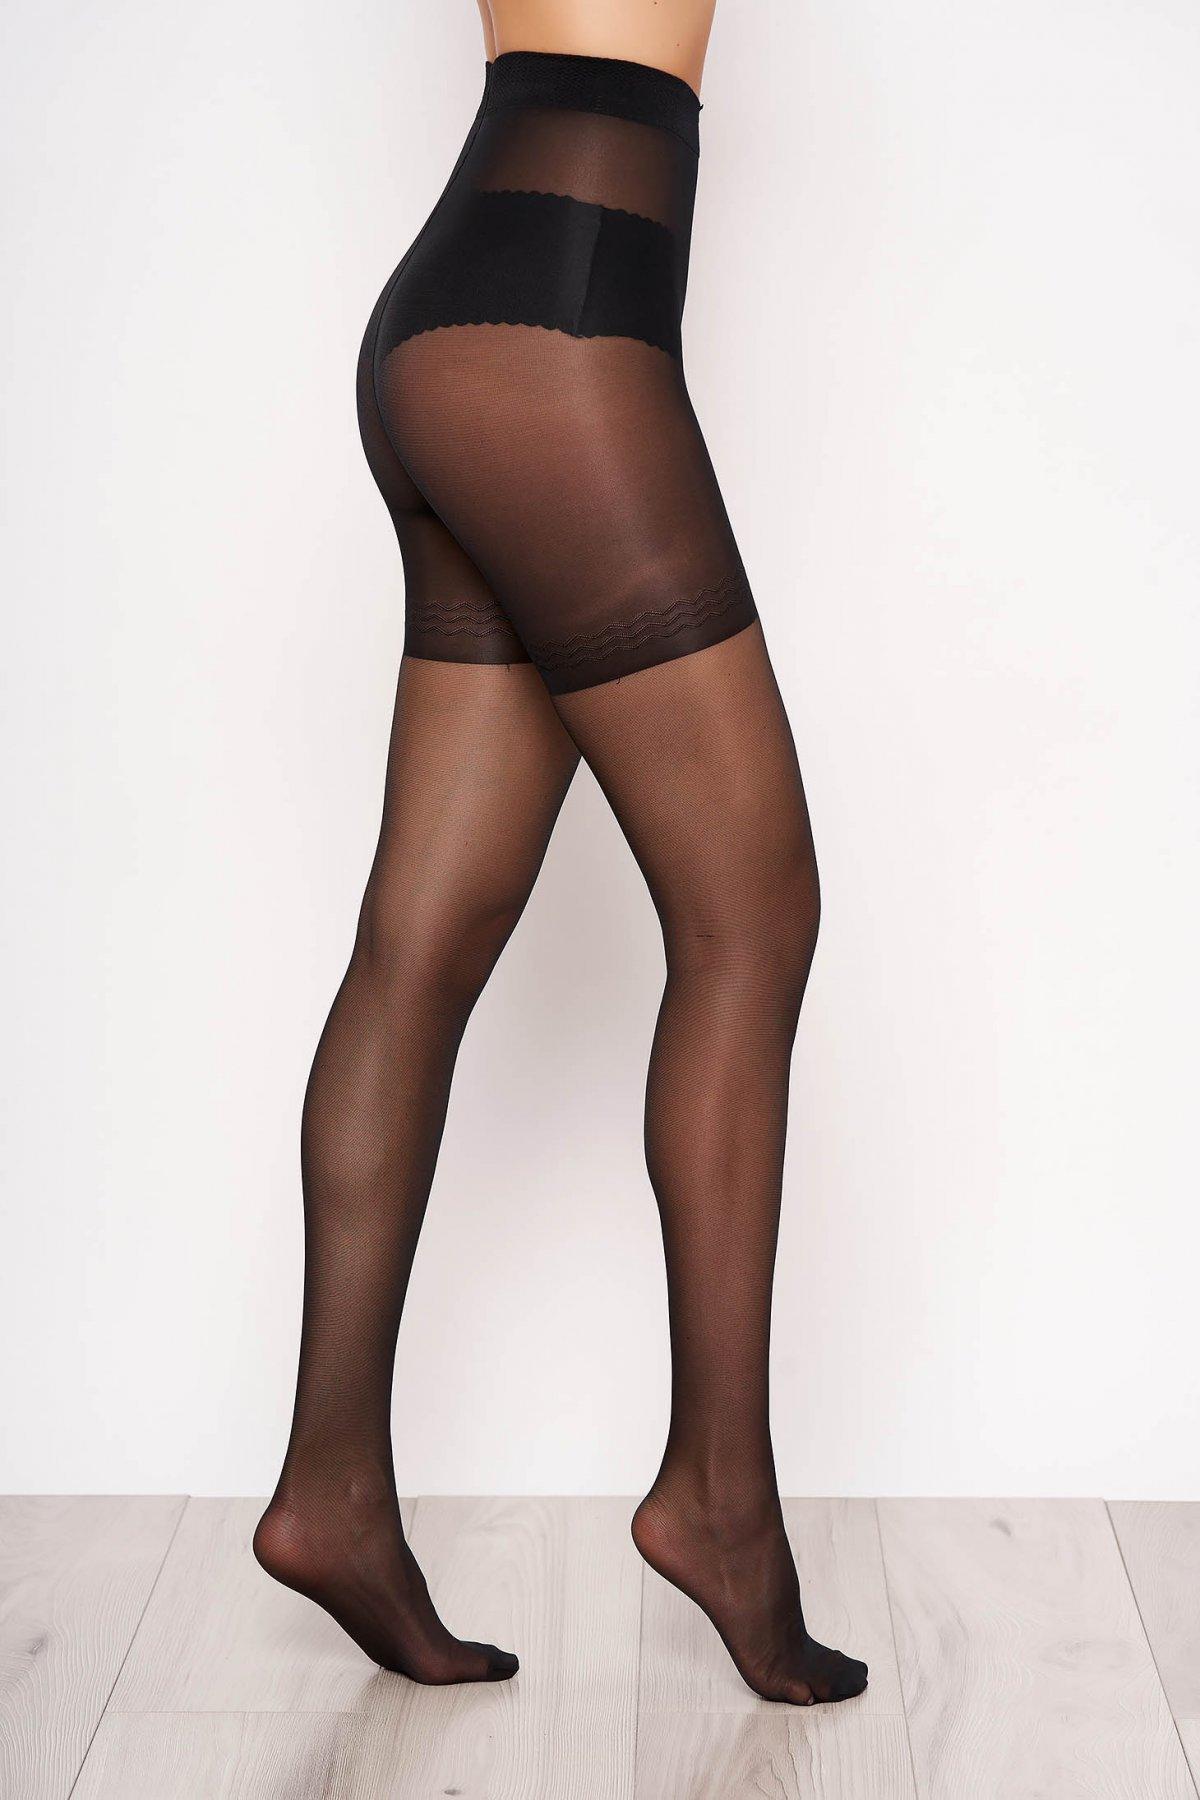 Dres dama modelator negru 20 den banda elastica care nu aluneca